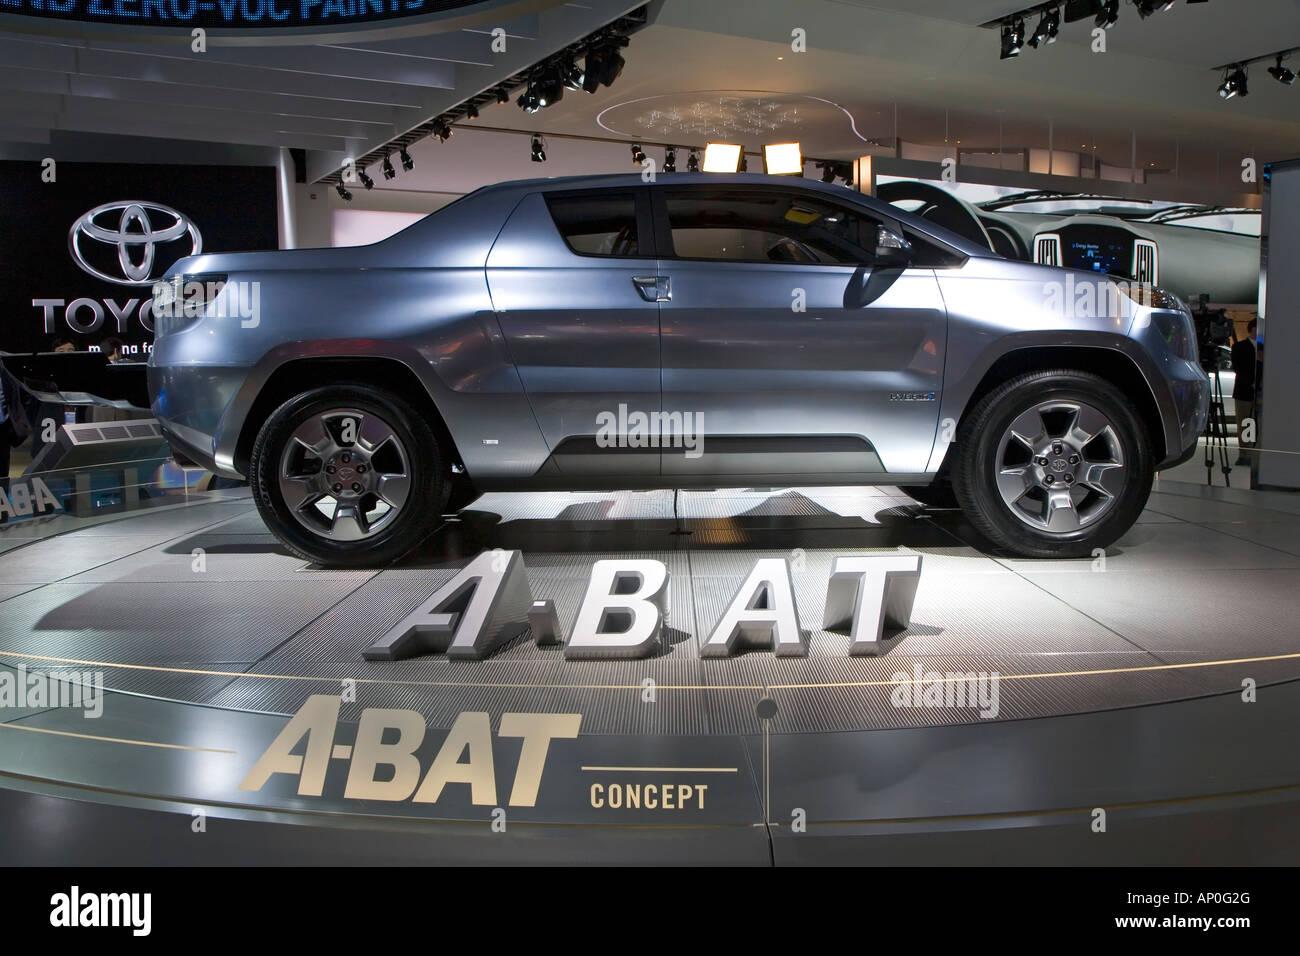 toyota a bat hybrid concept pickup truck stock photo royalty free image 15635223 alamy. Black Bedroom Furniture Sets. Home Design Ideas